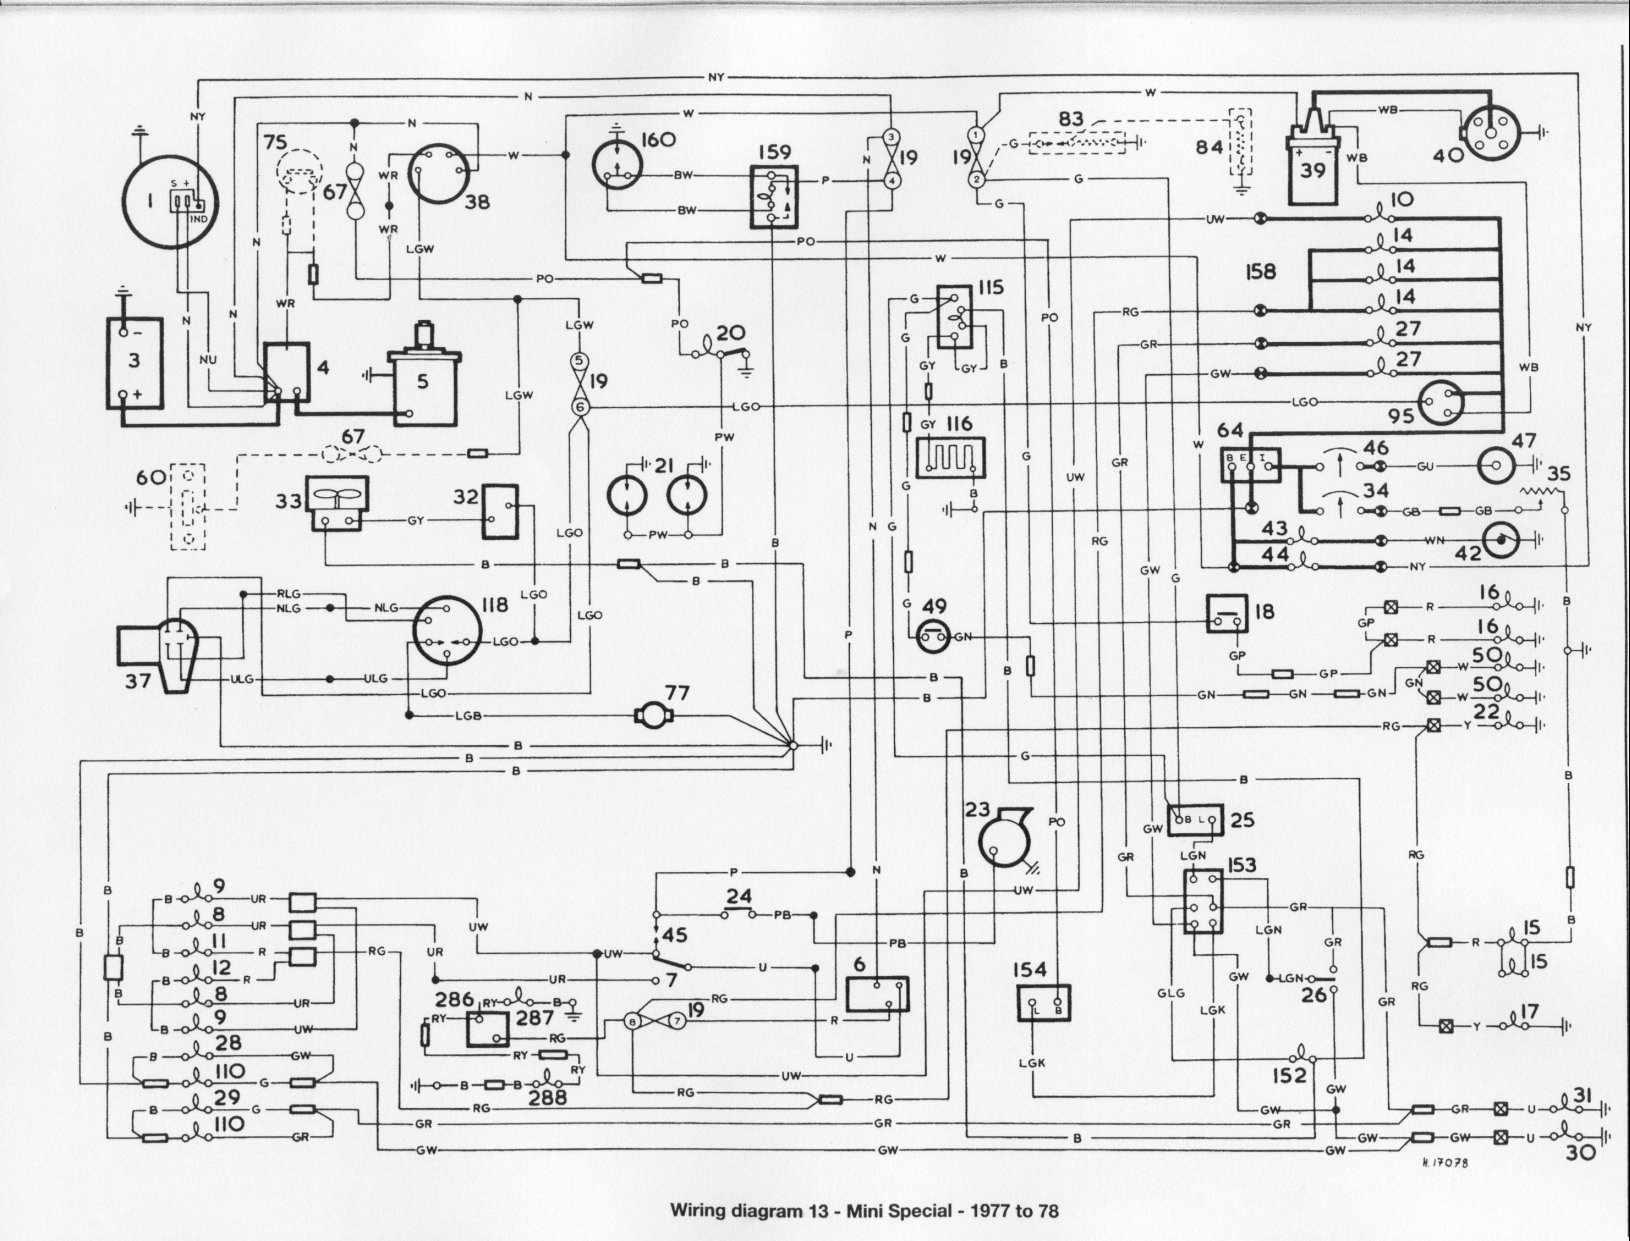 hight resolution of 1977 jeep cj5 wiringdiagram 1977 wiringdiagram